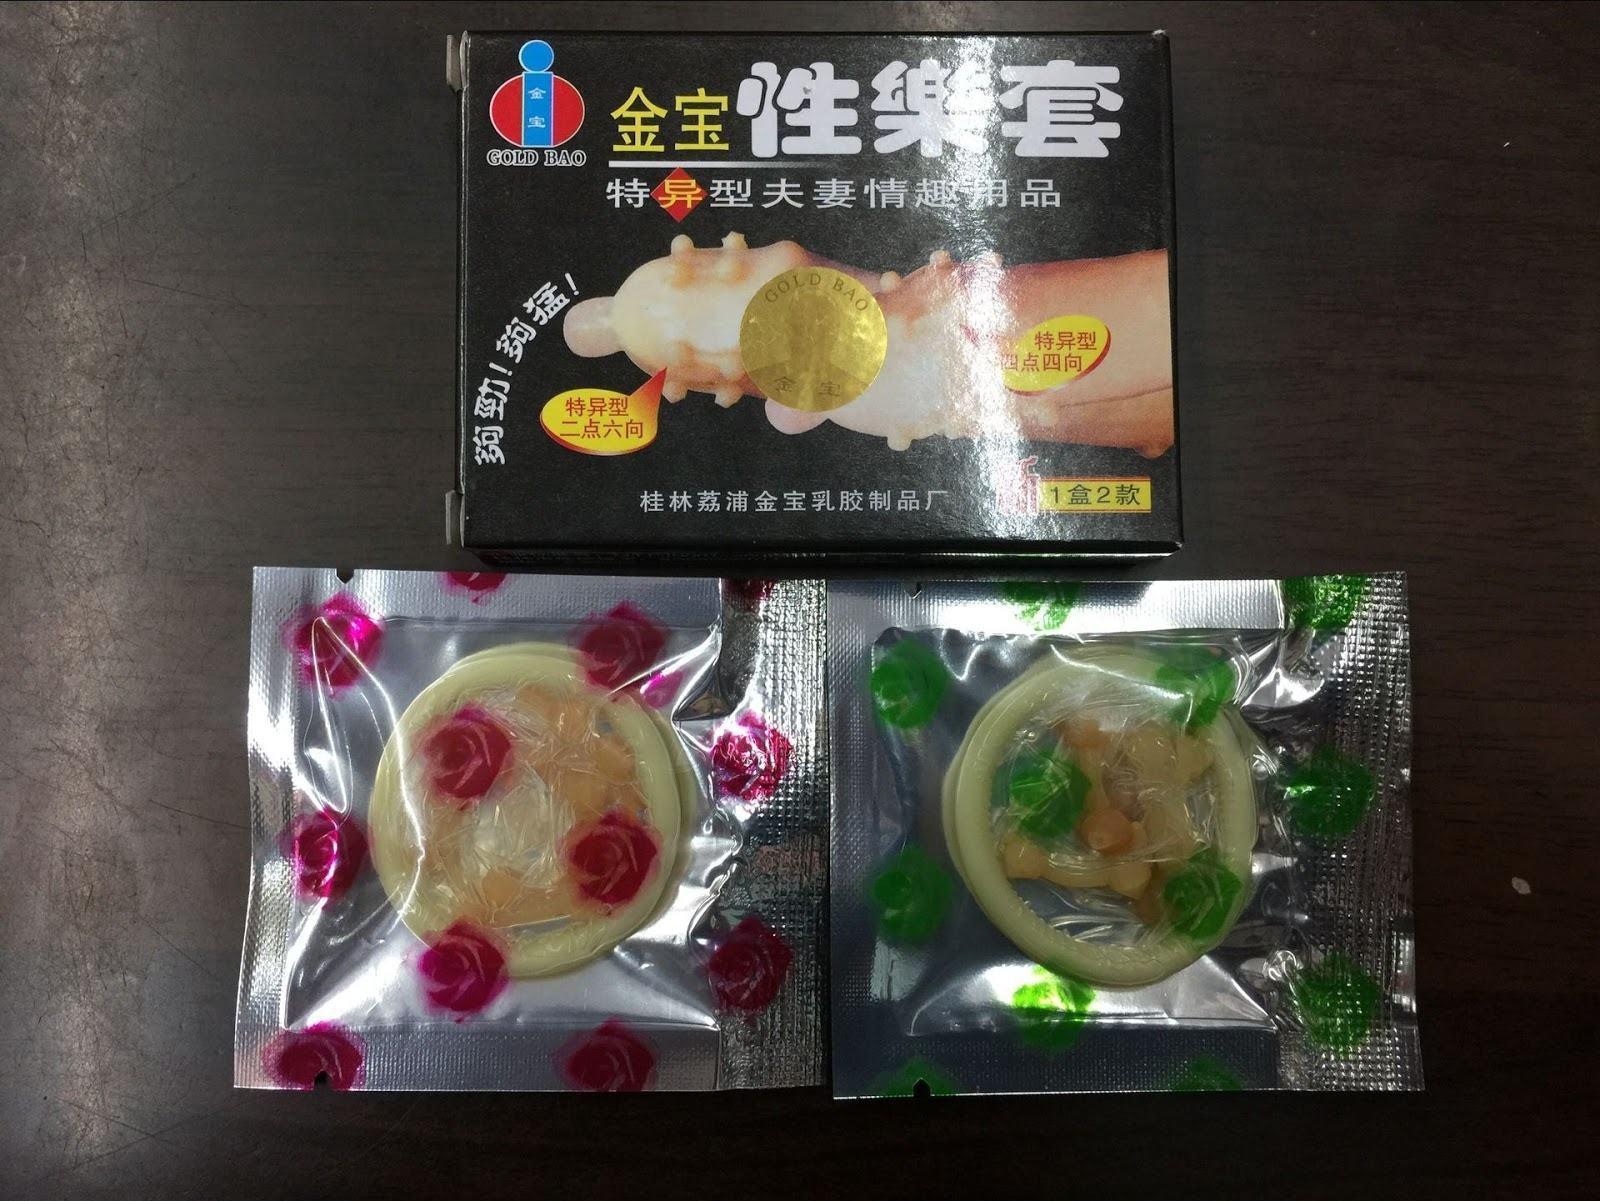 Bao cao su gold bao bi (Nhiều bi nhất)